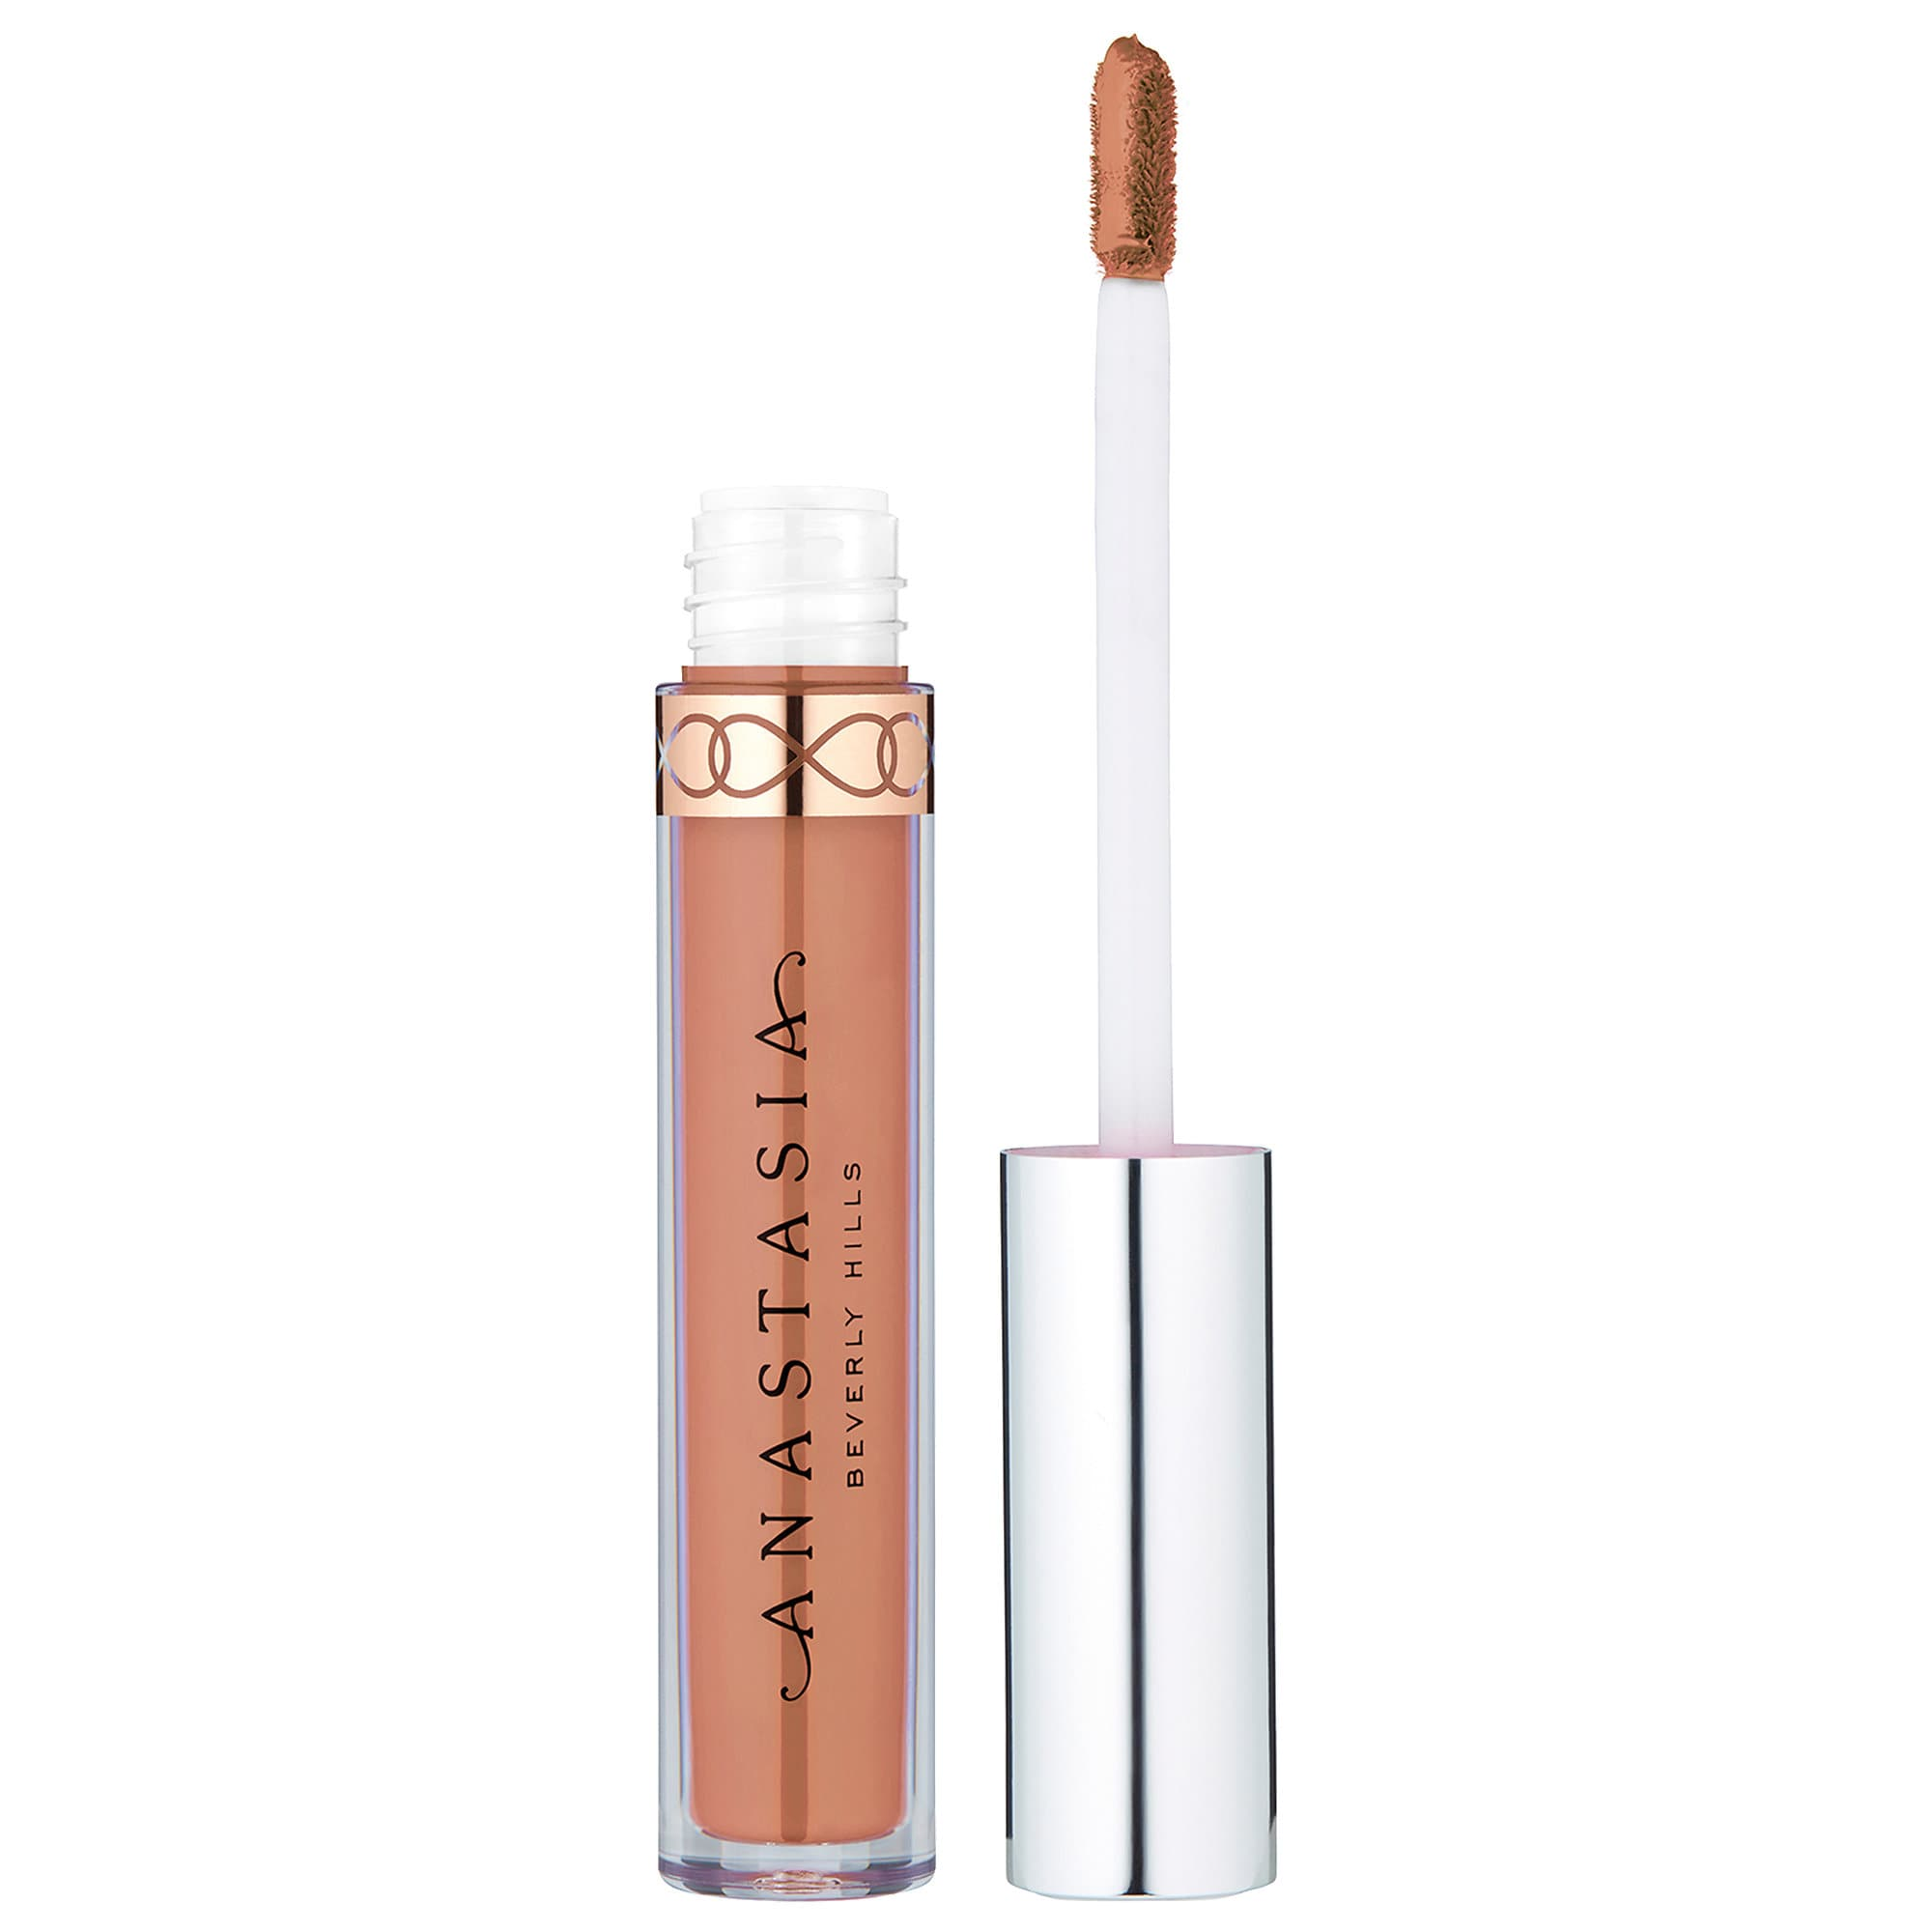 Peach Matte Lipstick - Honey - Anastasia Beverly Hills